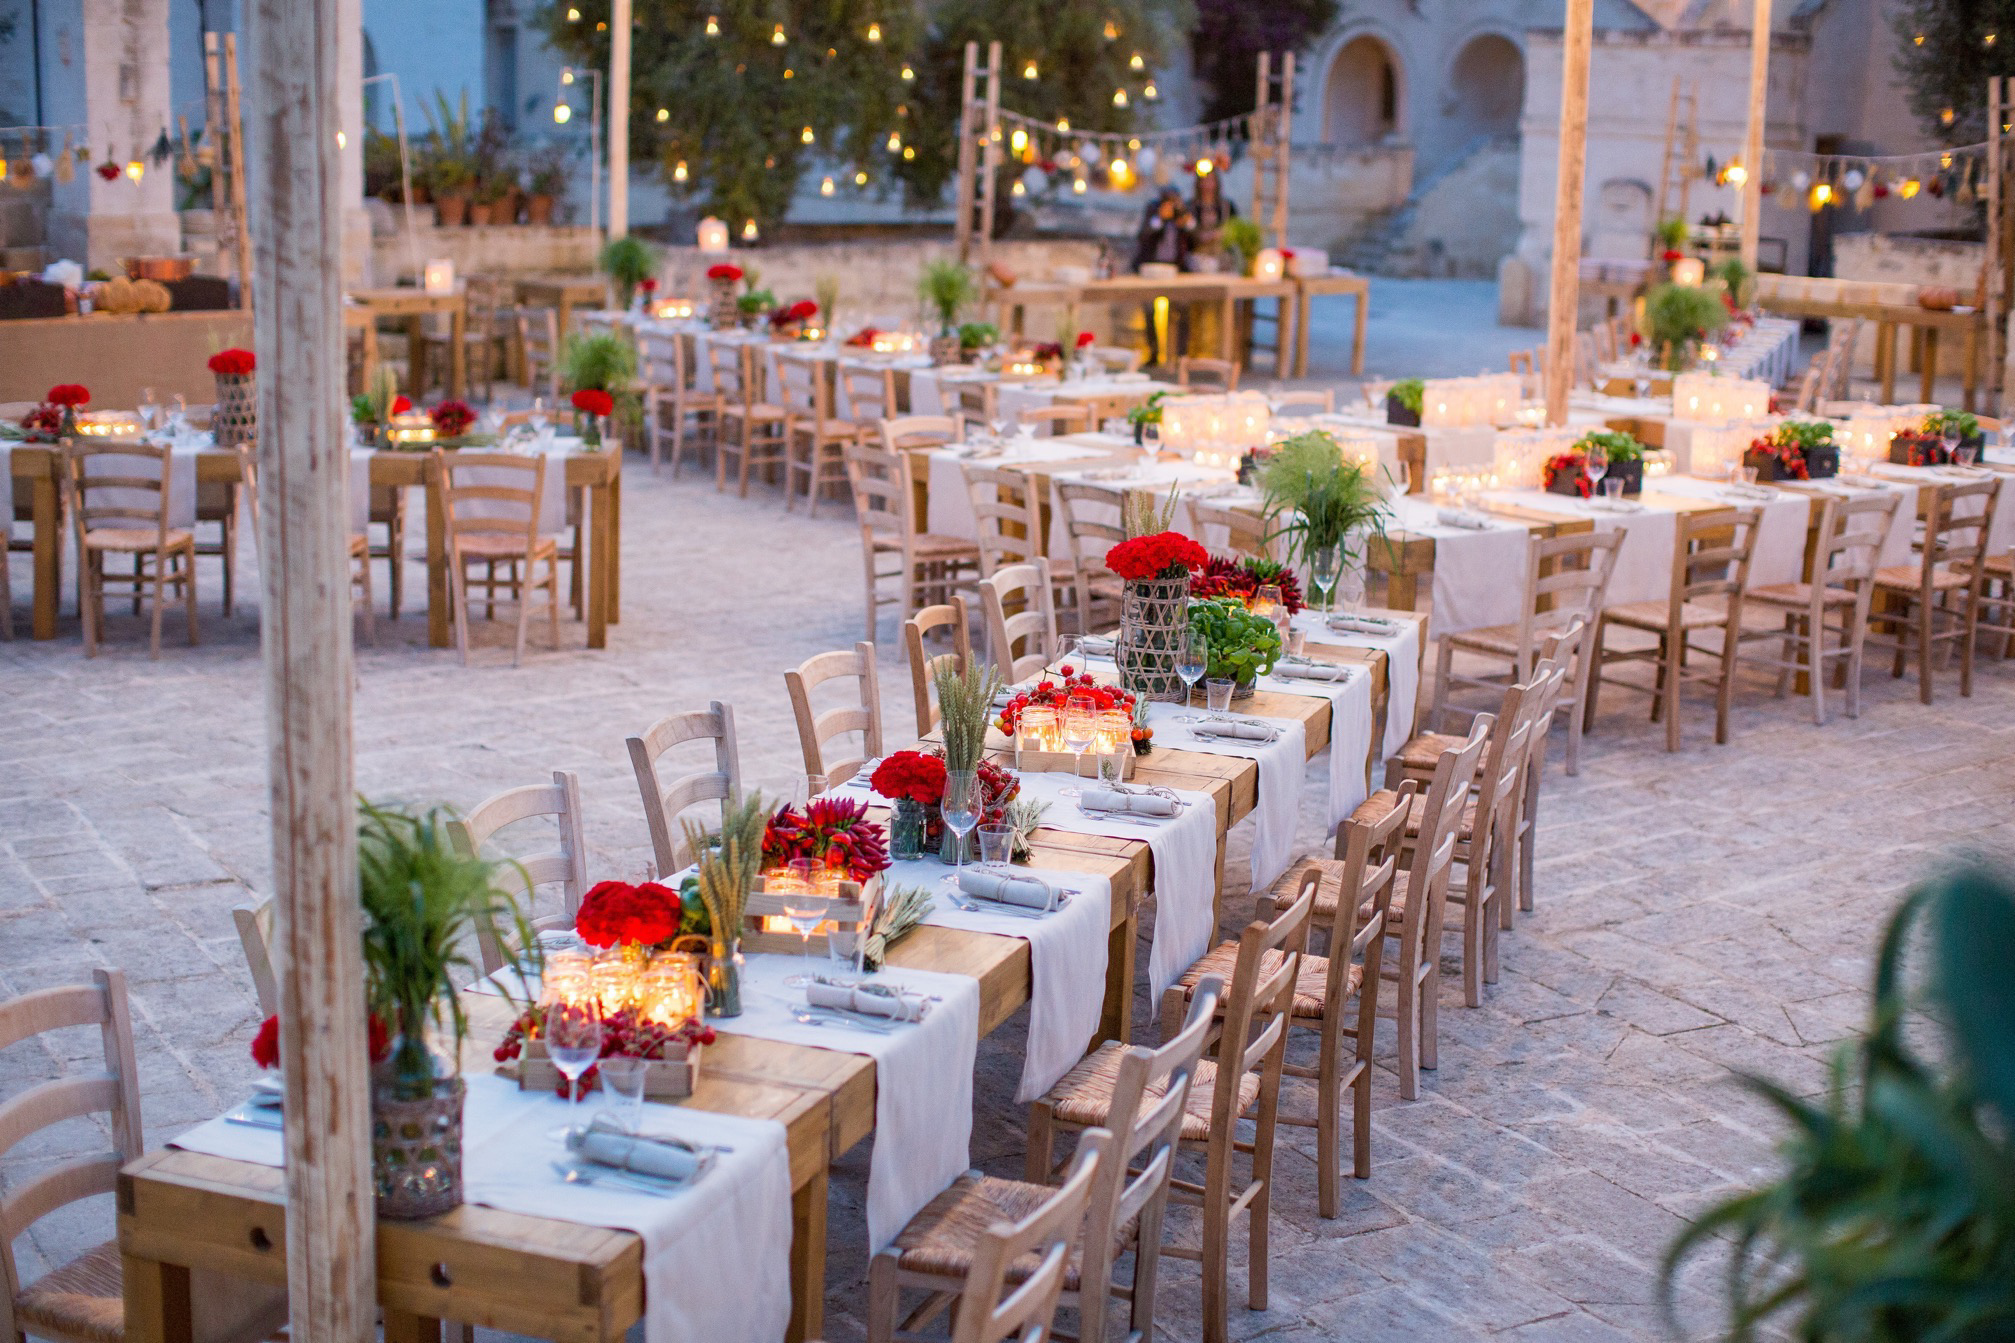 Jordanian Wedding Planner Organises Pre Apulian Welcome Dinner In Italy